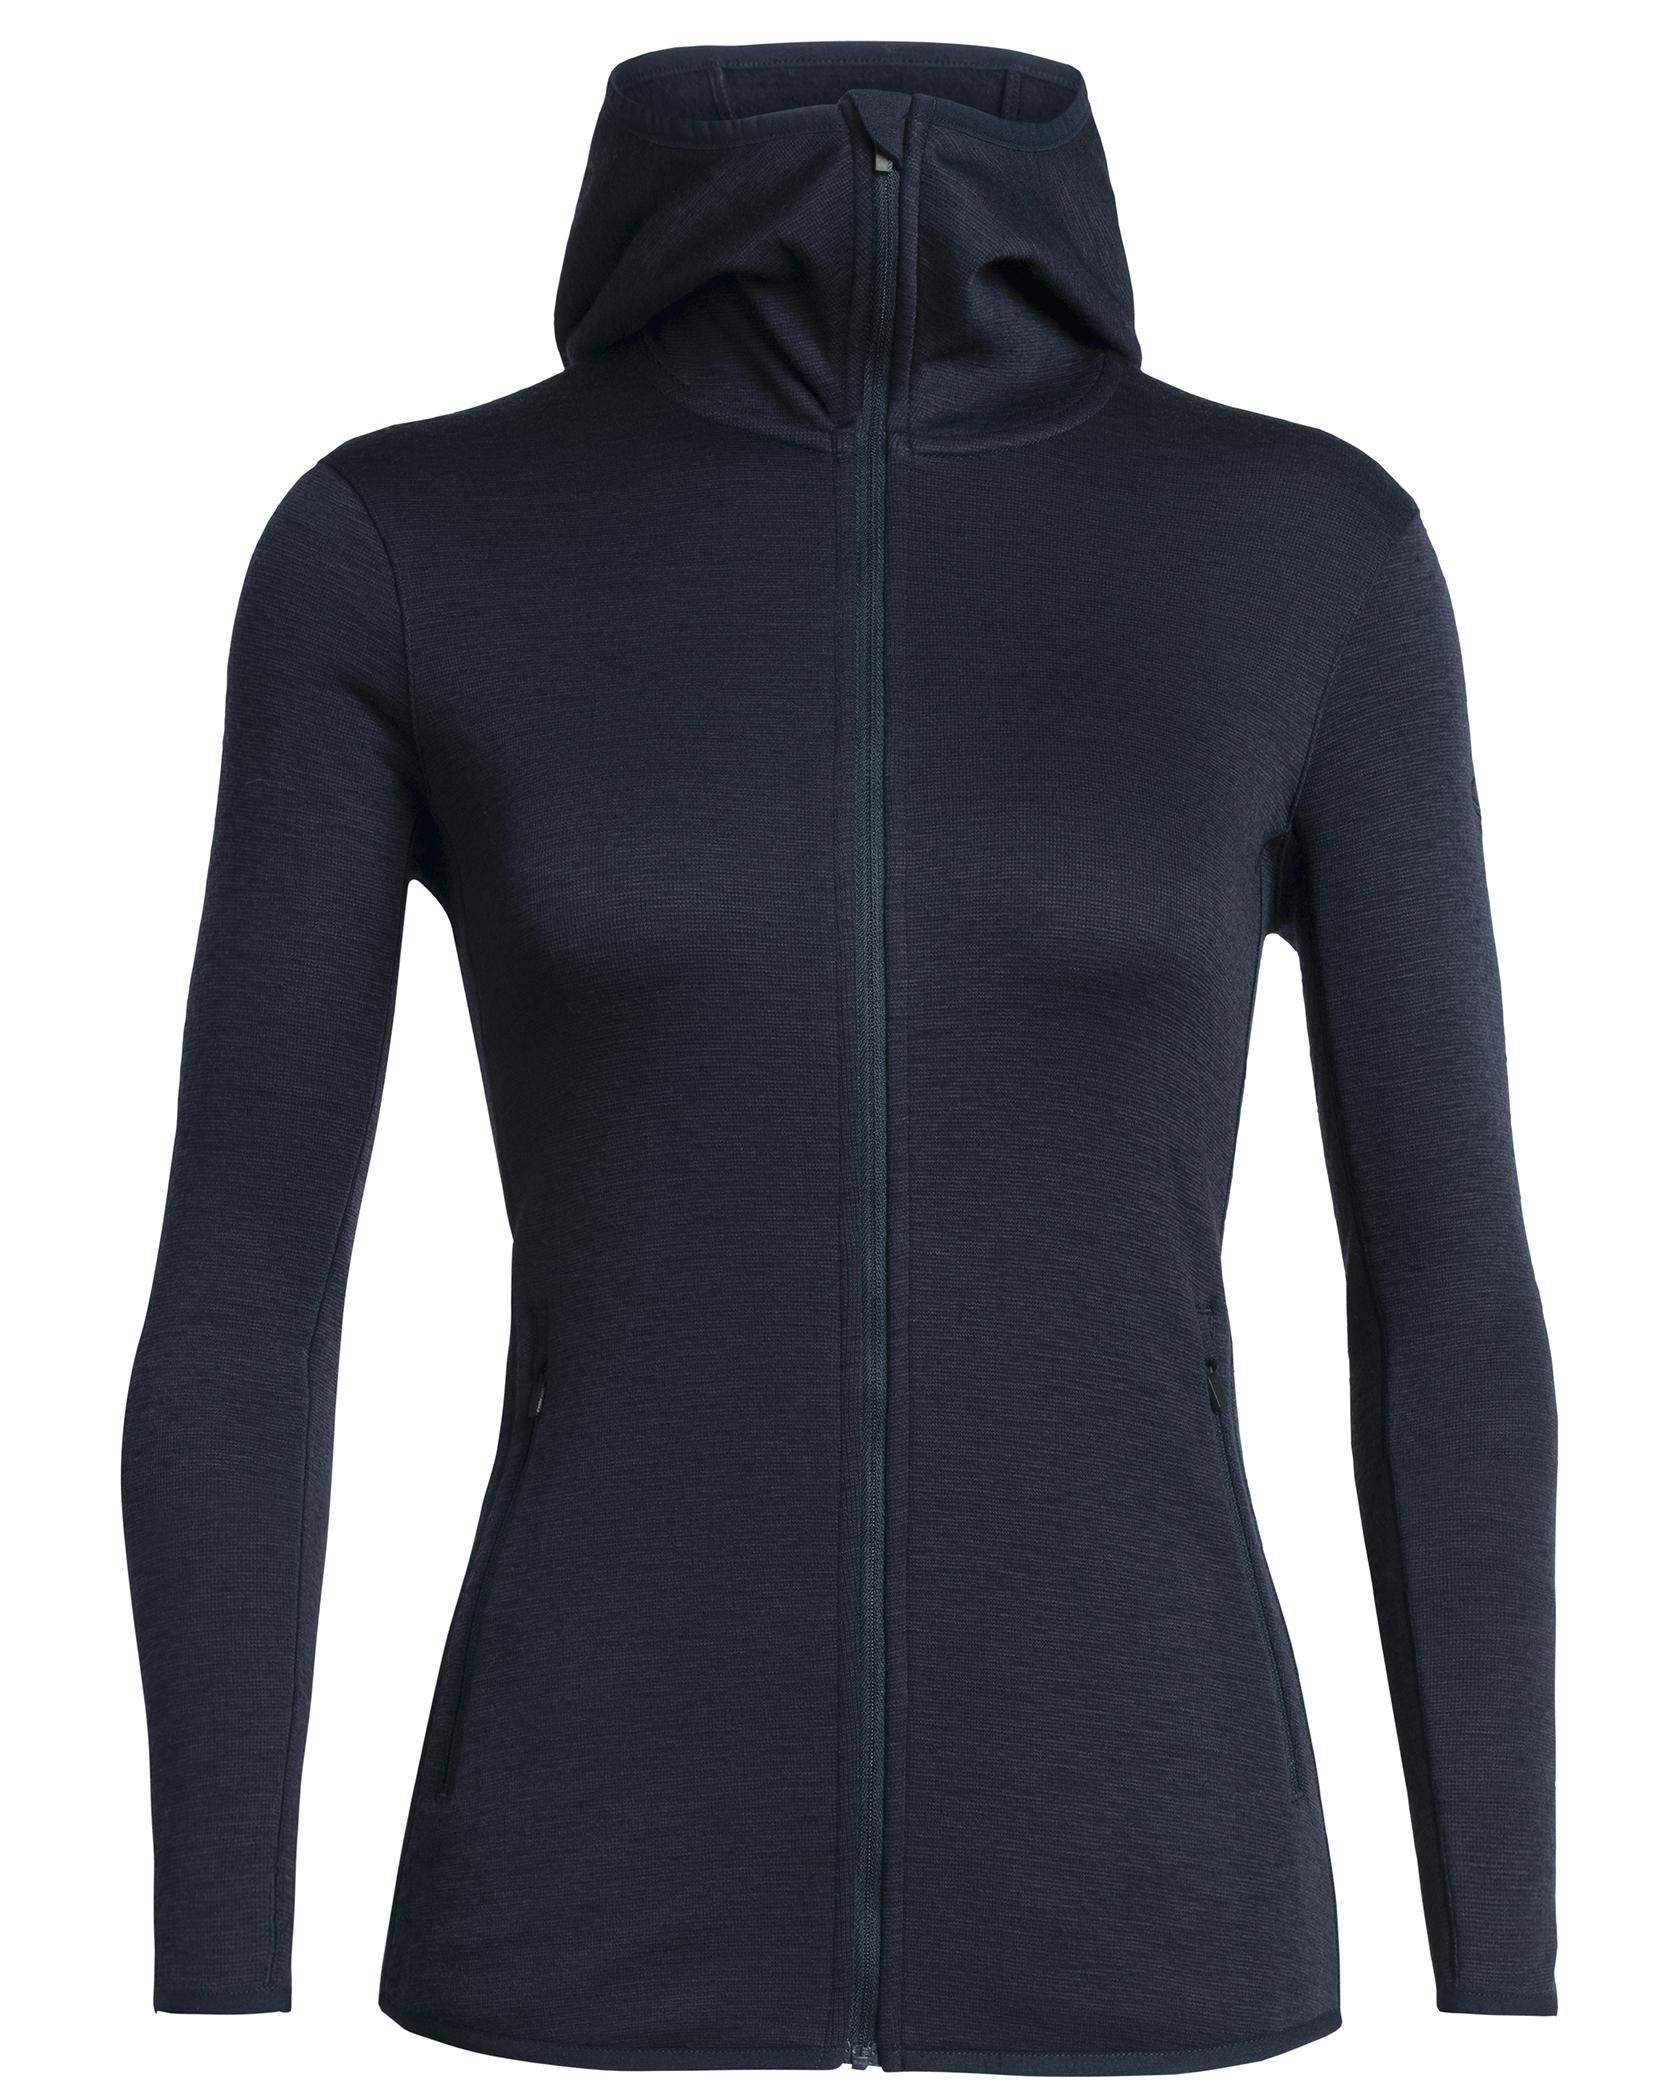 Elemental LS Zip Hood W Midnight Navy